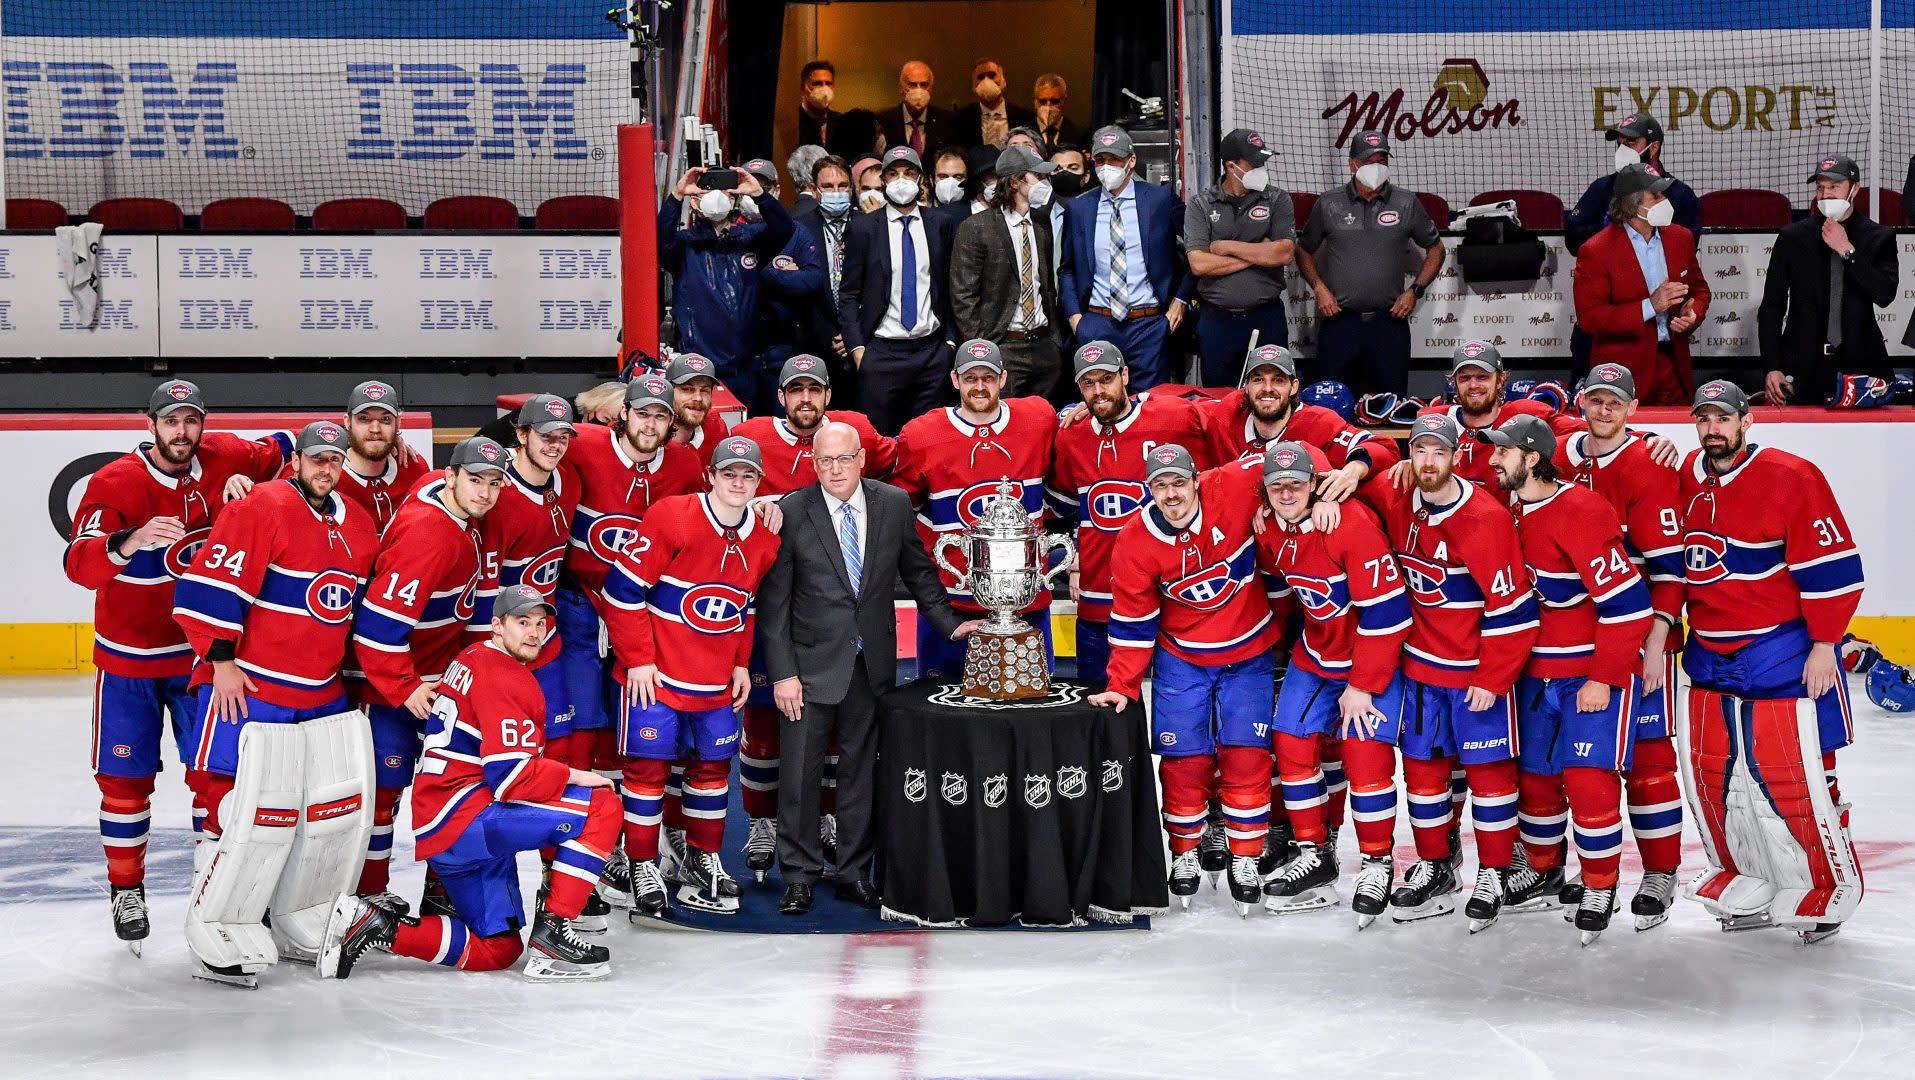 Artturi Lehkonen sends Canadiens to Stanley Cup Final with overtime goal